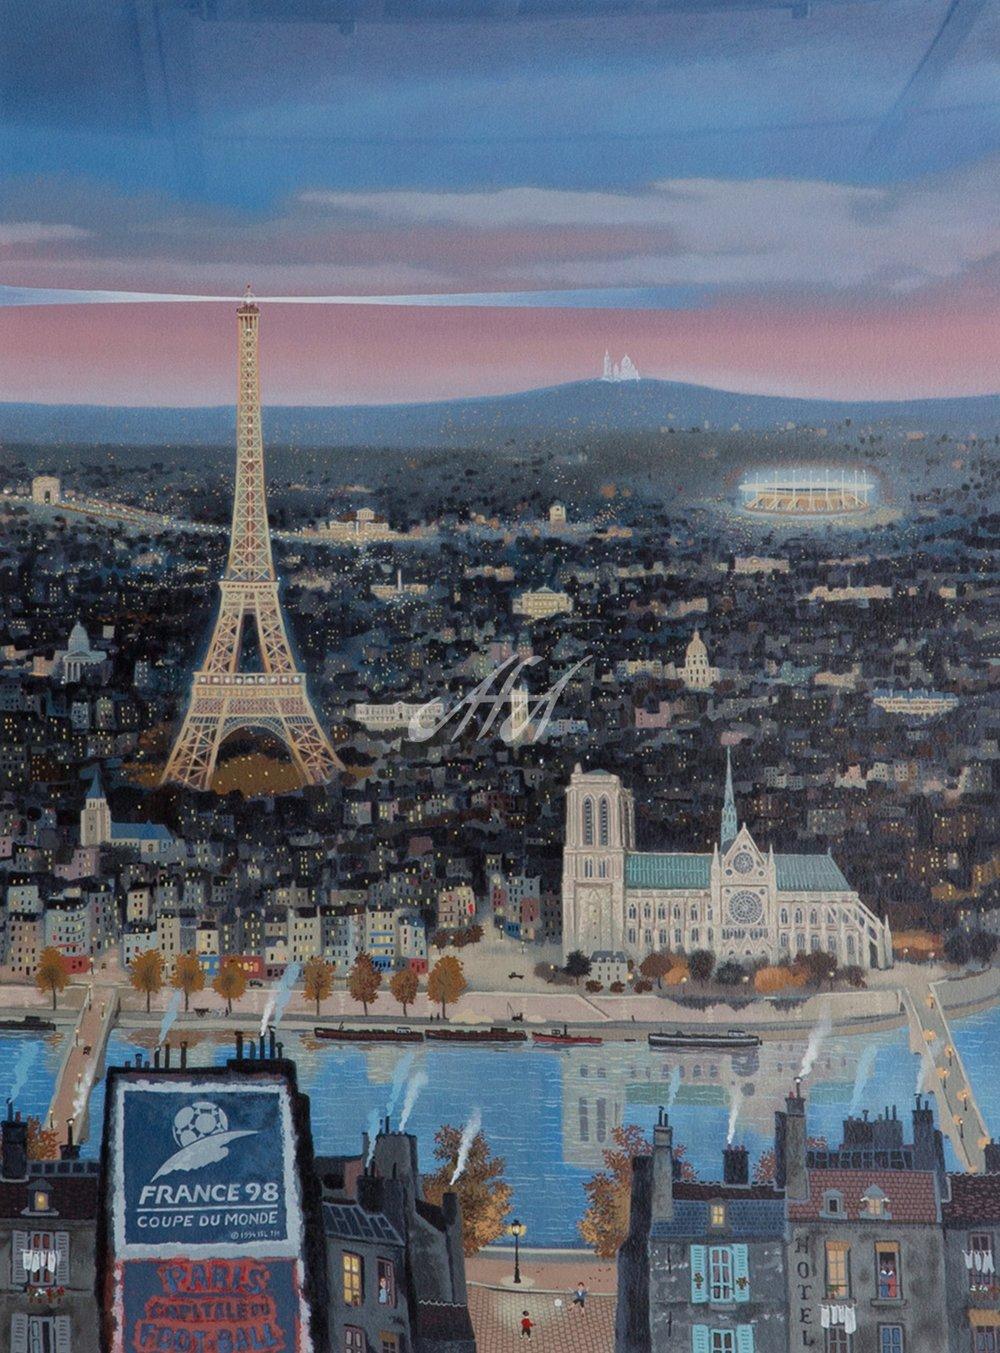 Michel_Delacroix_Paris6 LoRes watermark.jpg